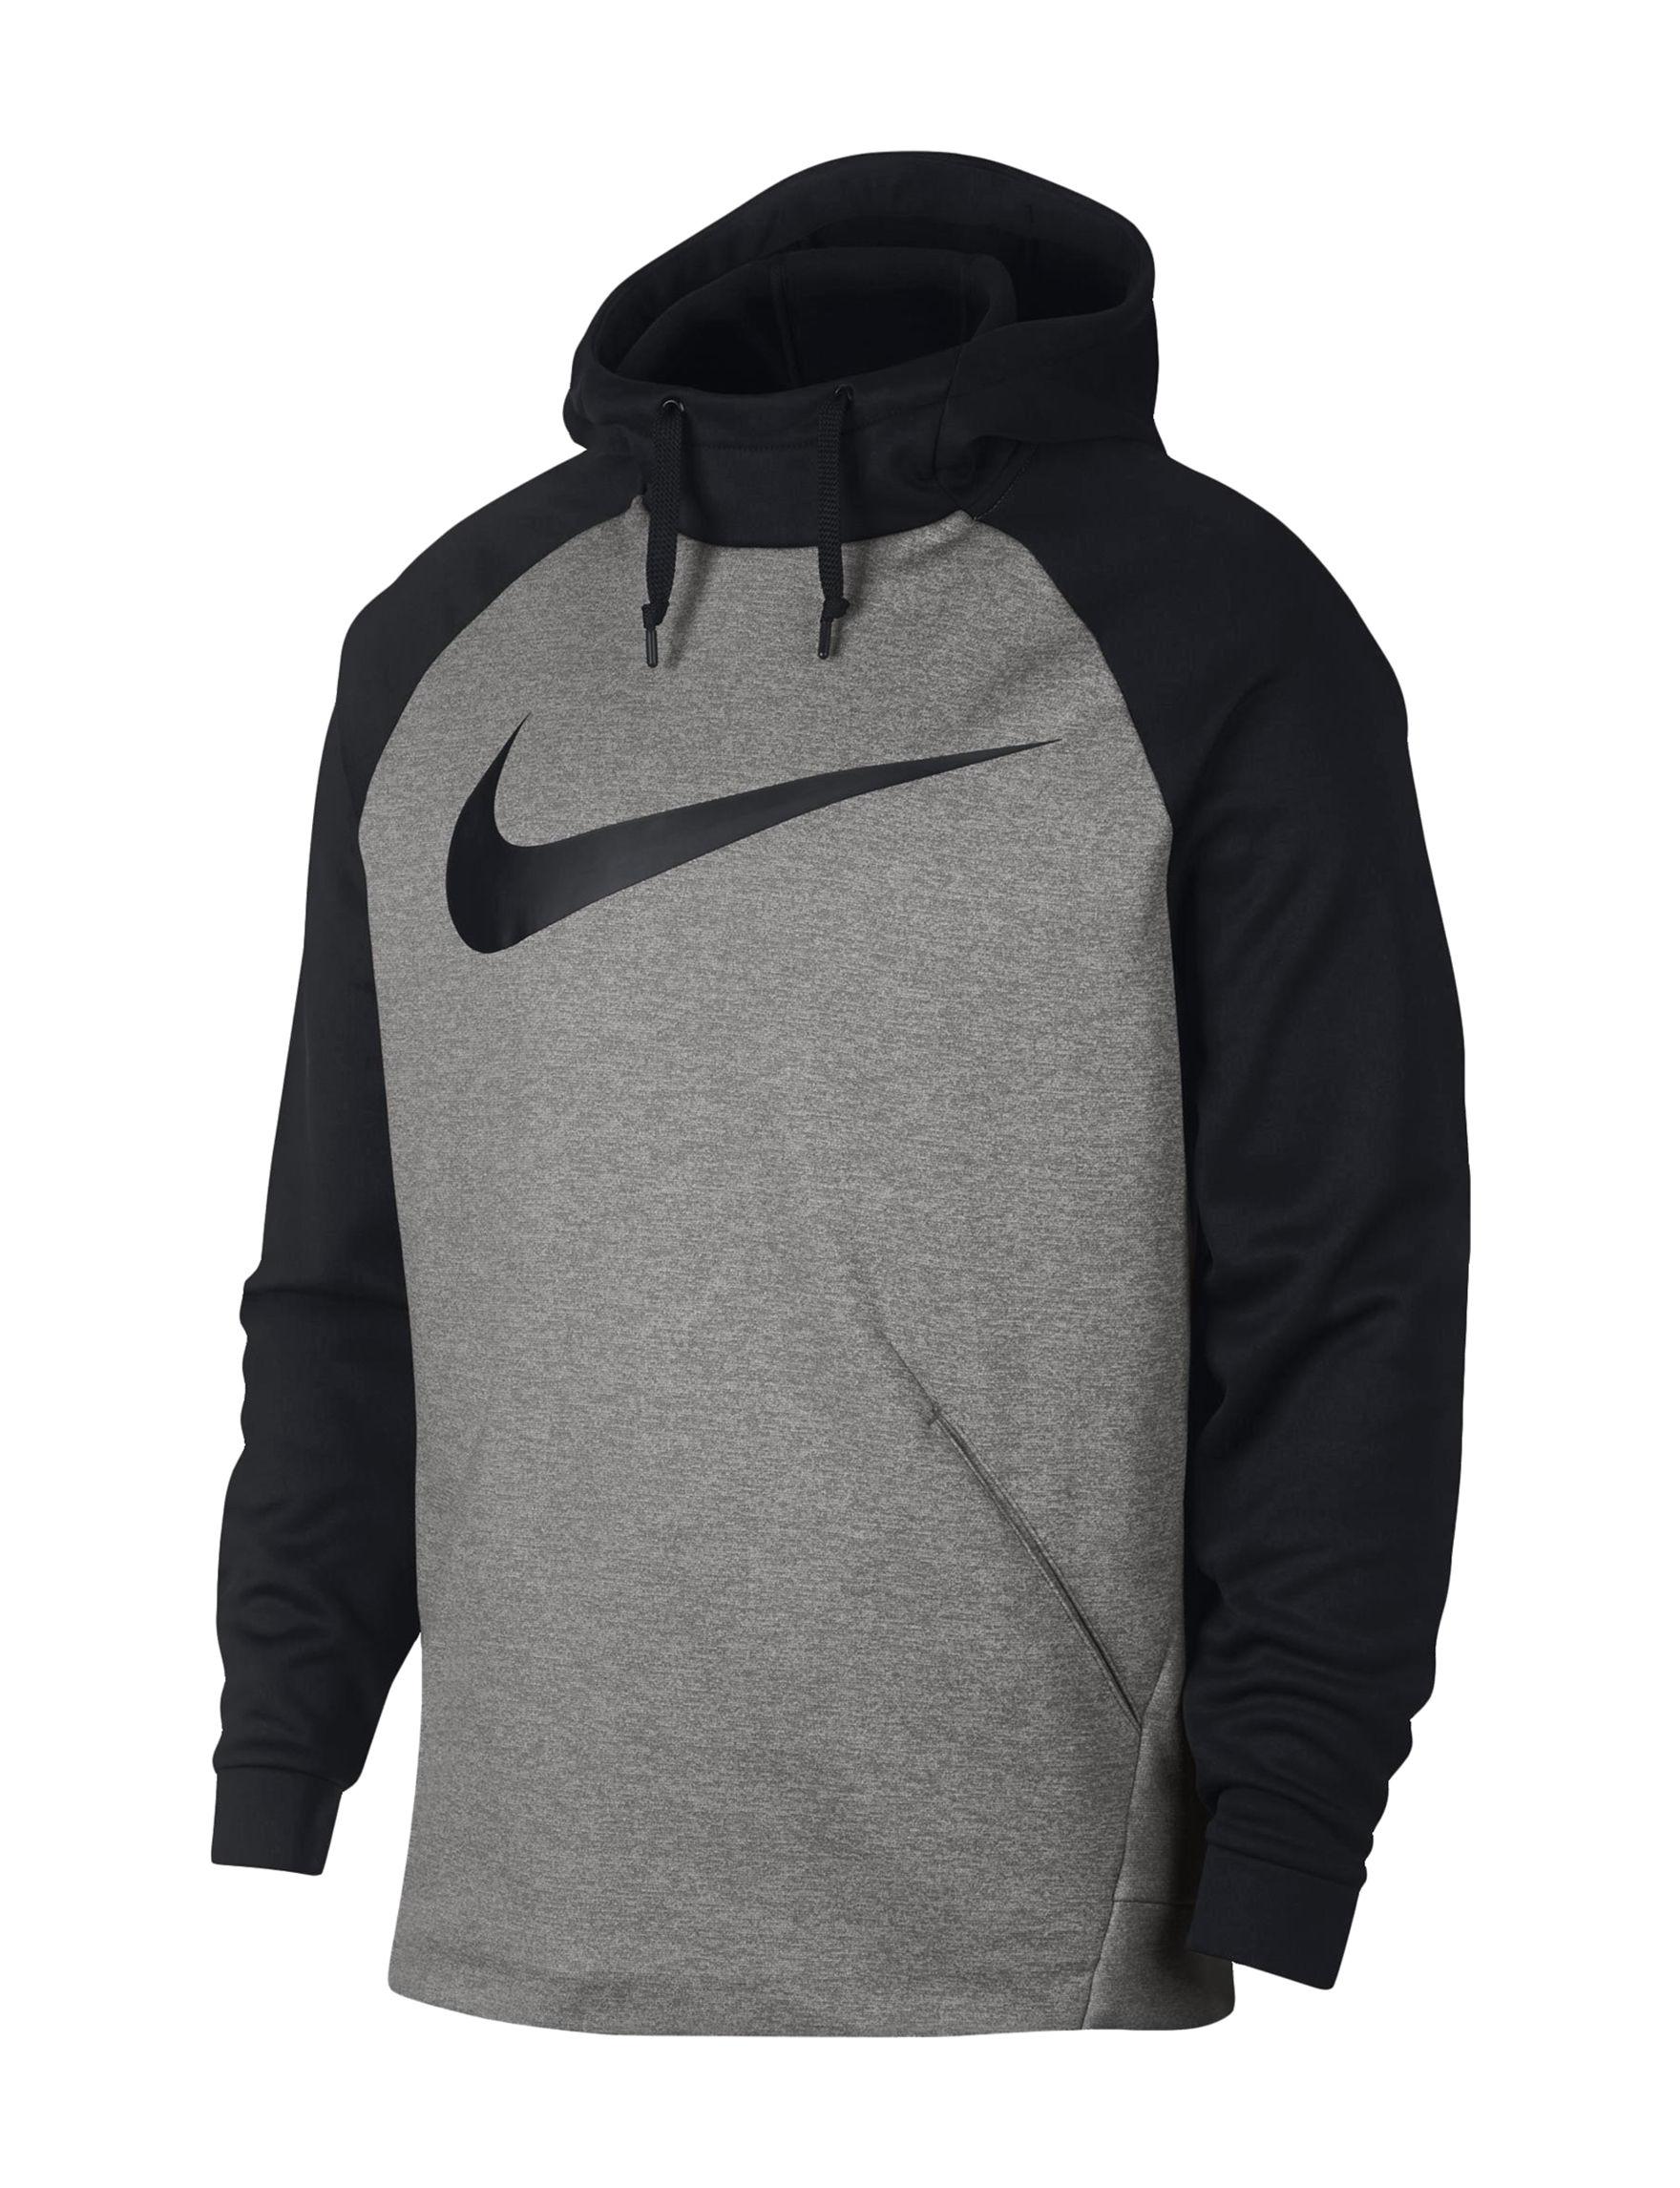 Nike Heather Grey Pull-overs